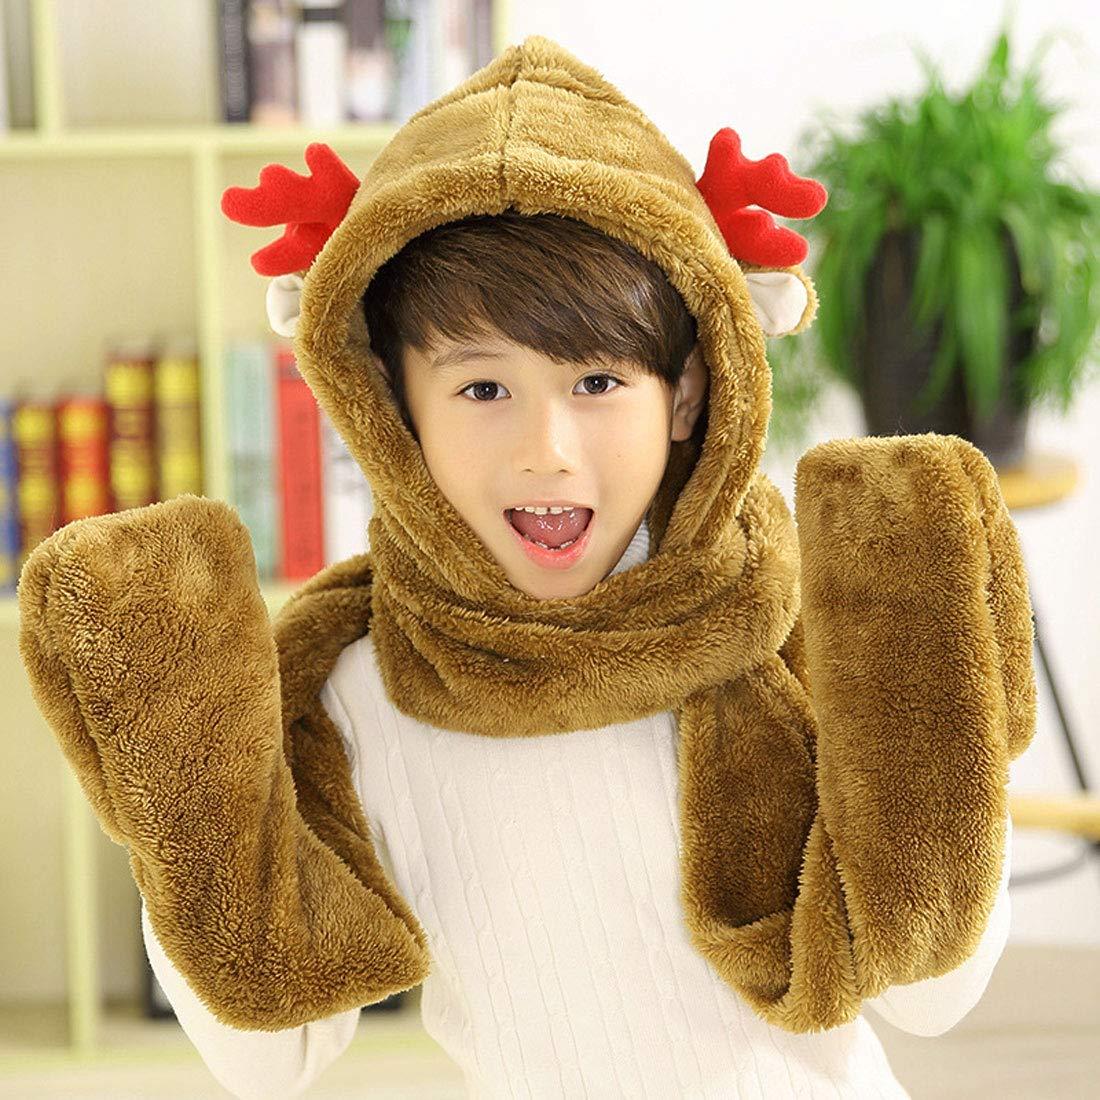 363f509663e1 Animal Fleece Hats Gloves Scarf 3 In 1 Set Winter Cap Baby Earflap Hood  Scarf for